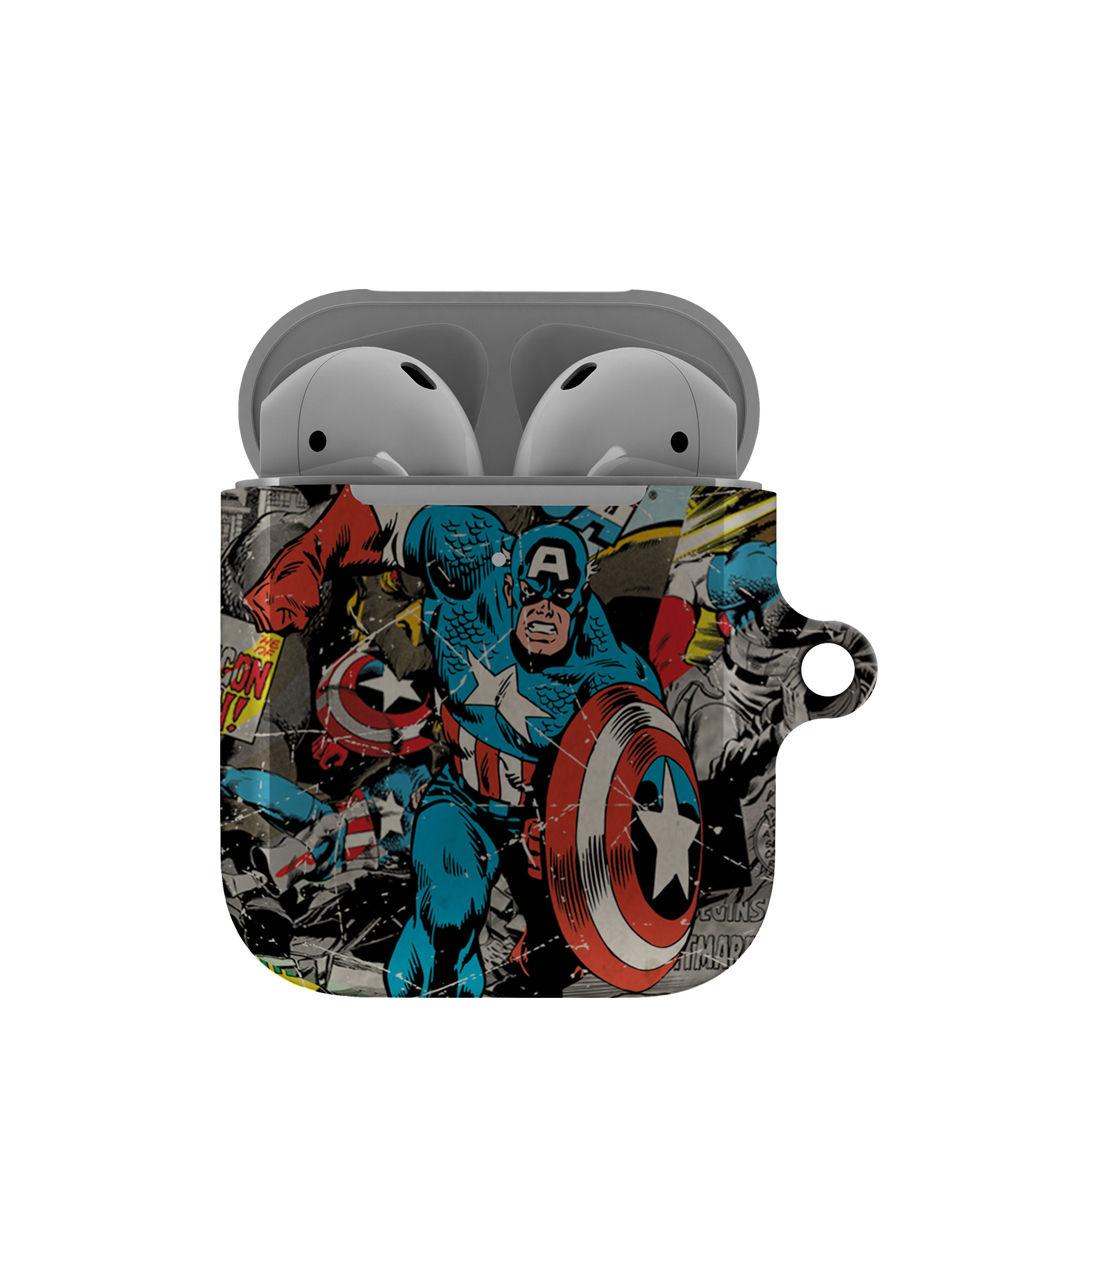 Comic Captain America - Hard Shell Airpod Case